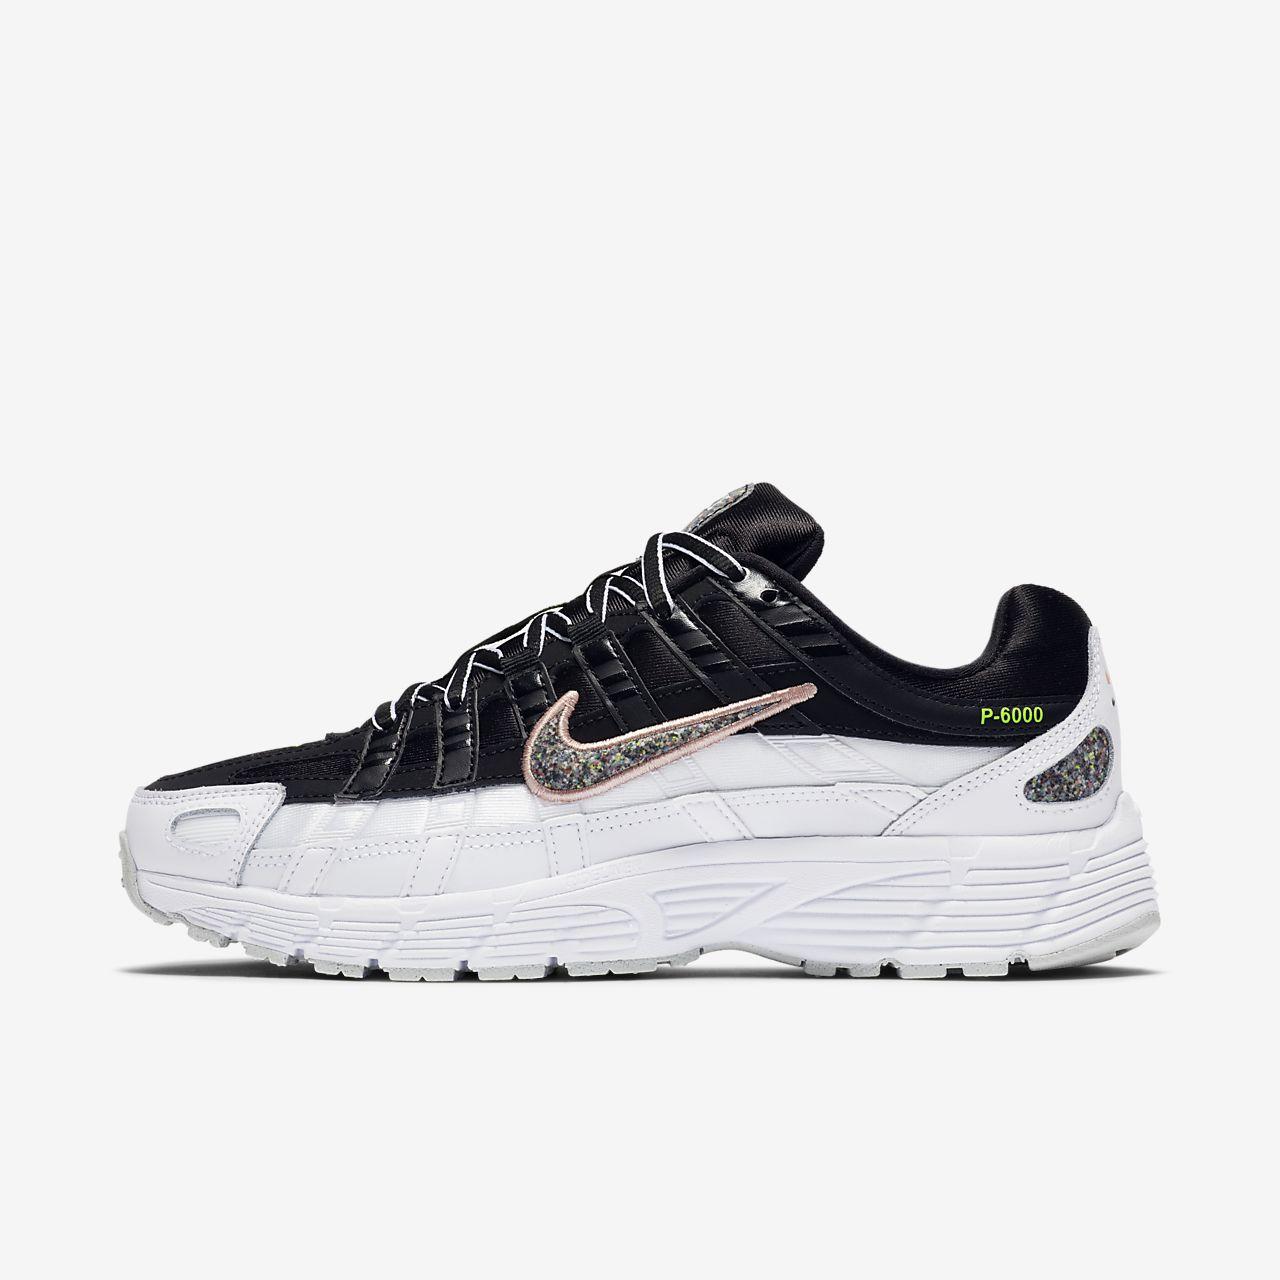 Sko Nike P-6000 SE för kvinnor